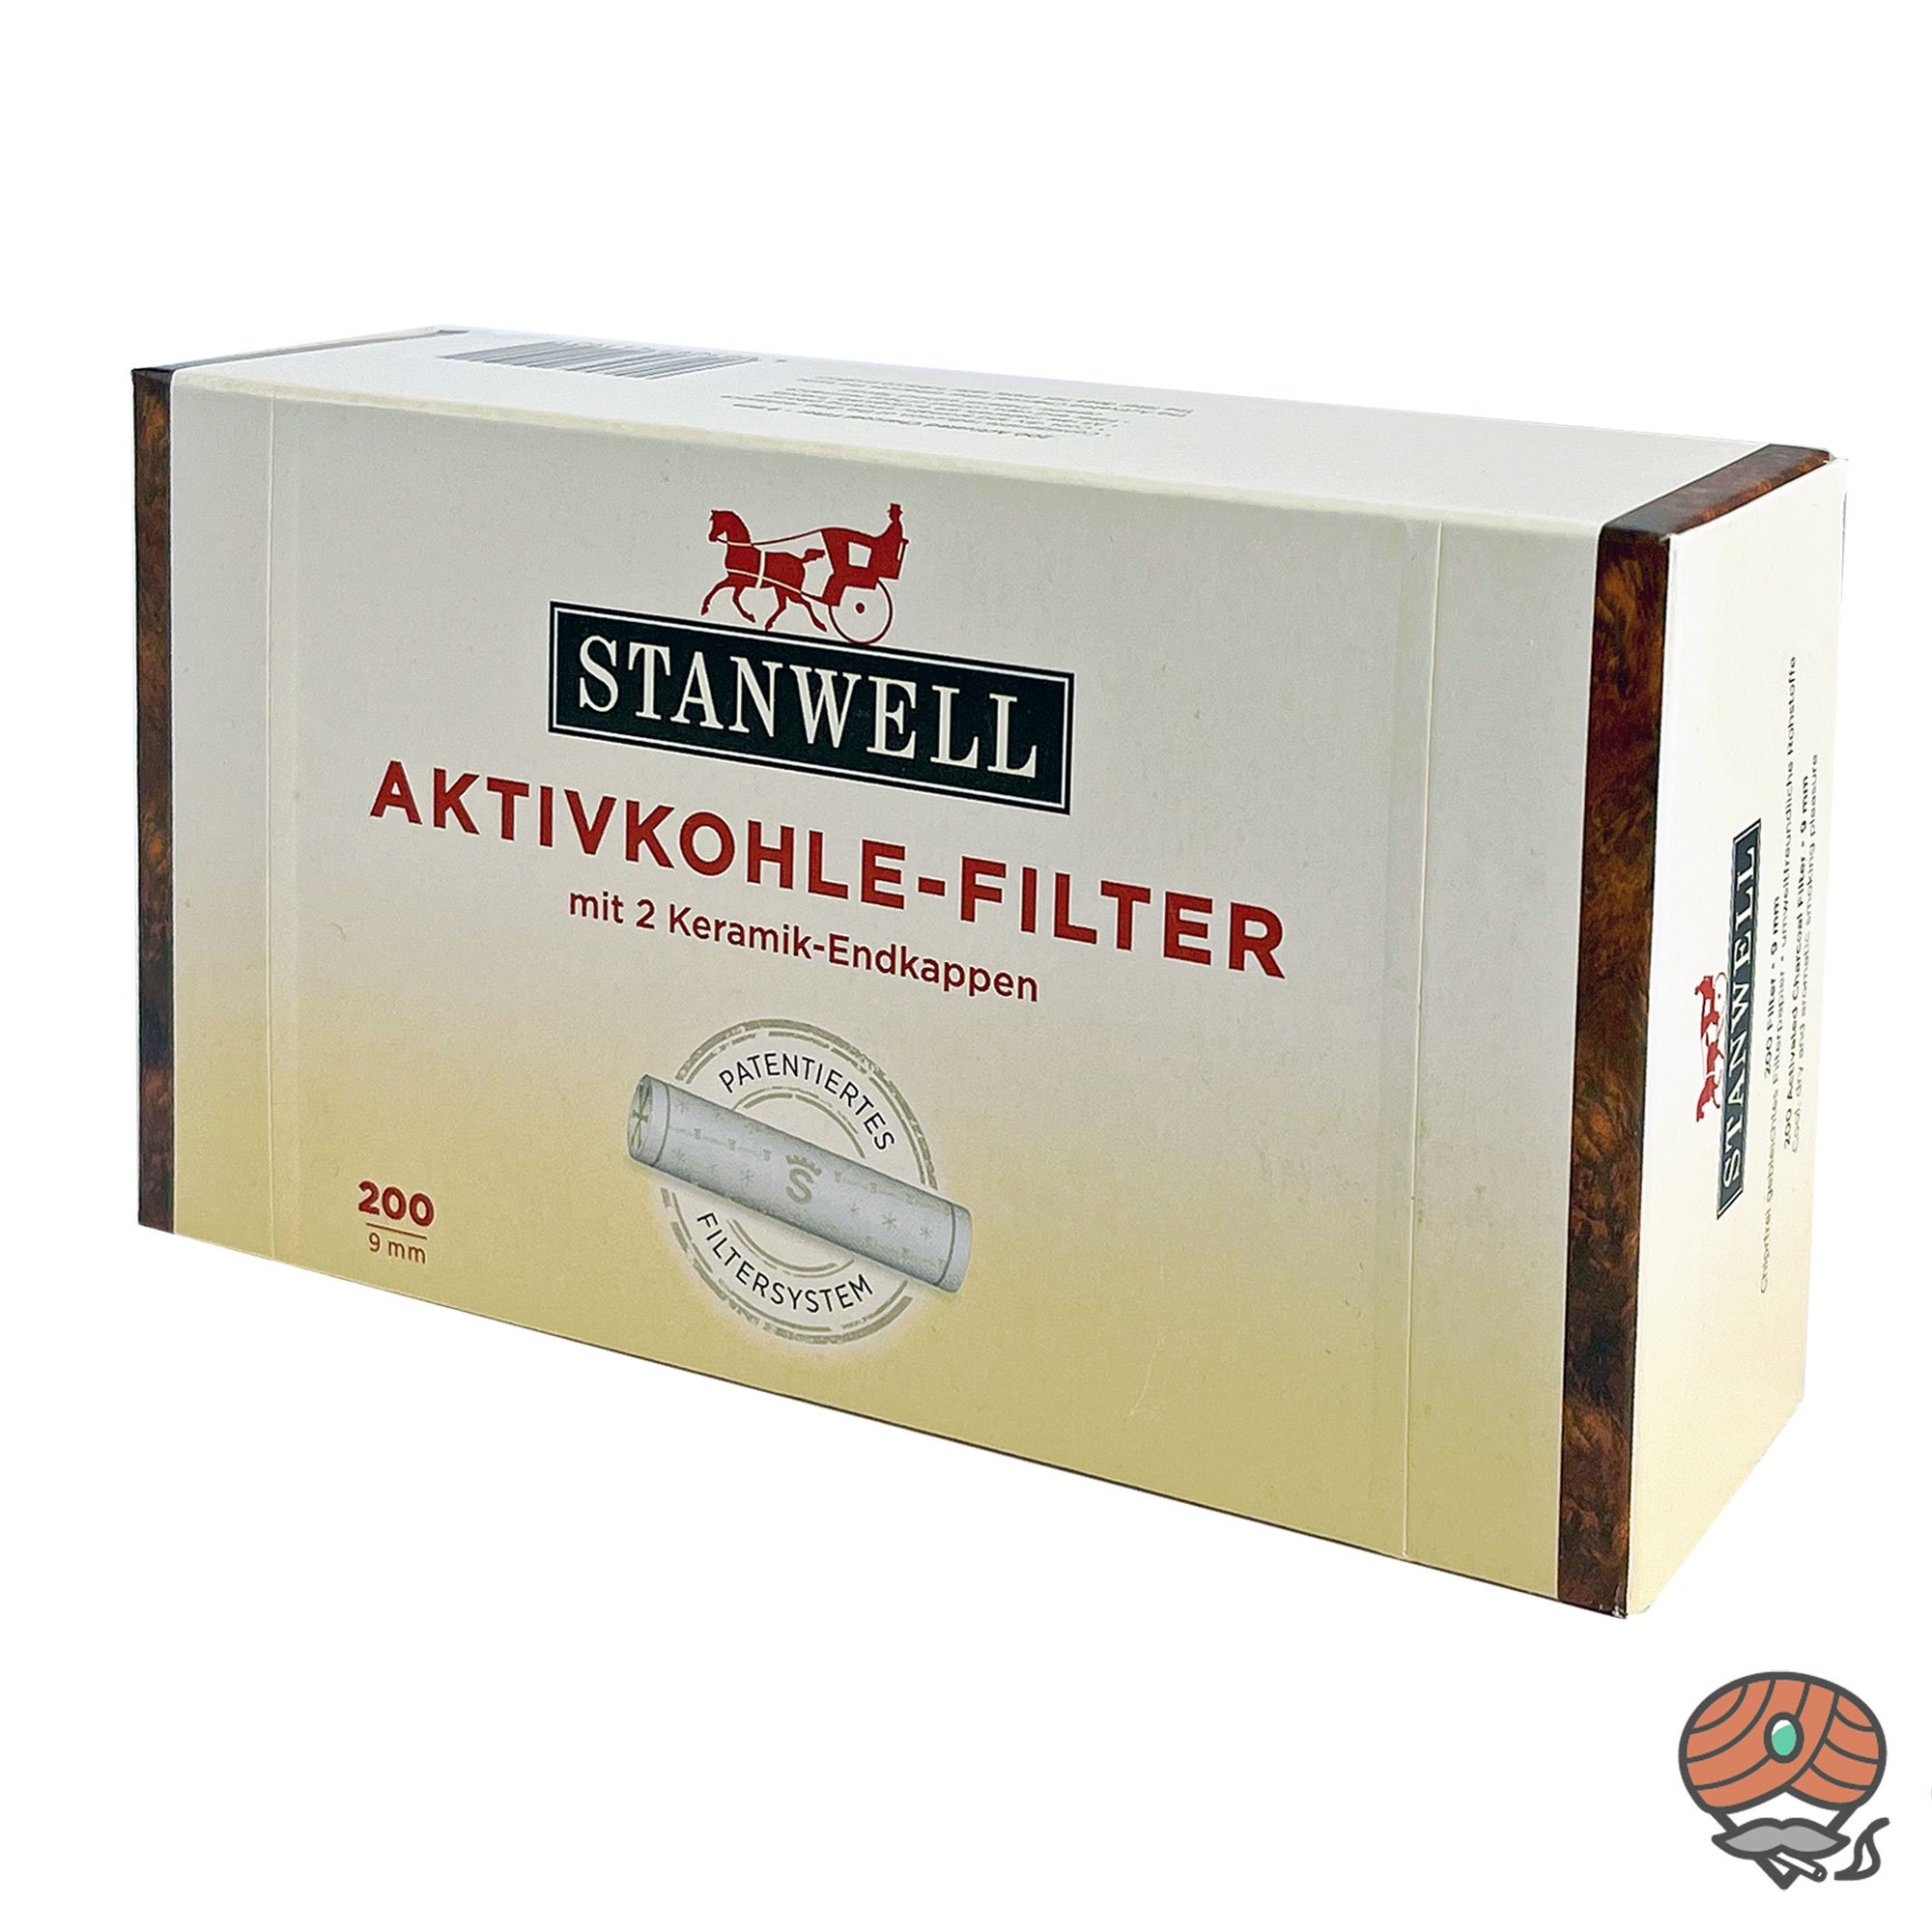 Stanwell Aktivkohle-Filter 9mm mit 2 Keramik-Endkappen 200 Stück